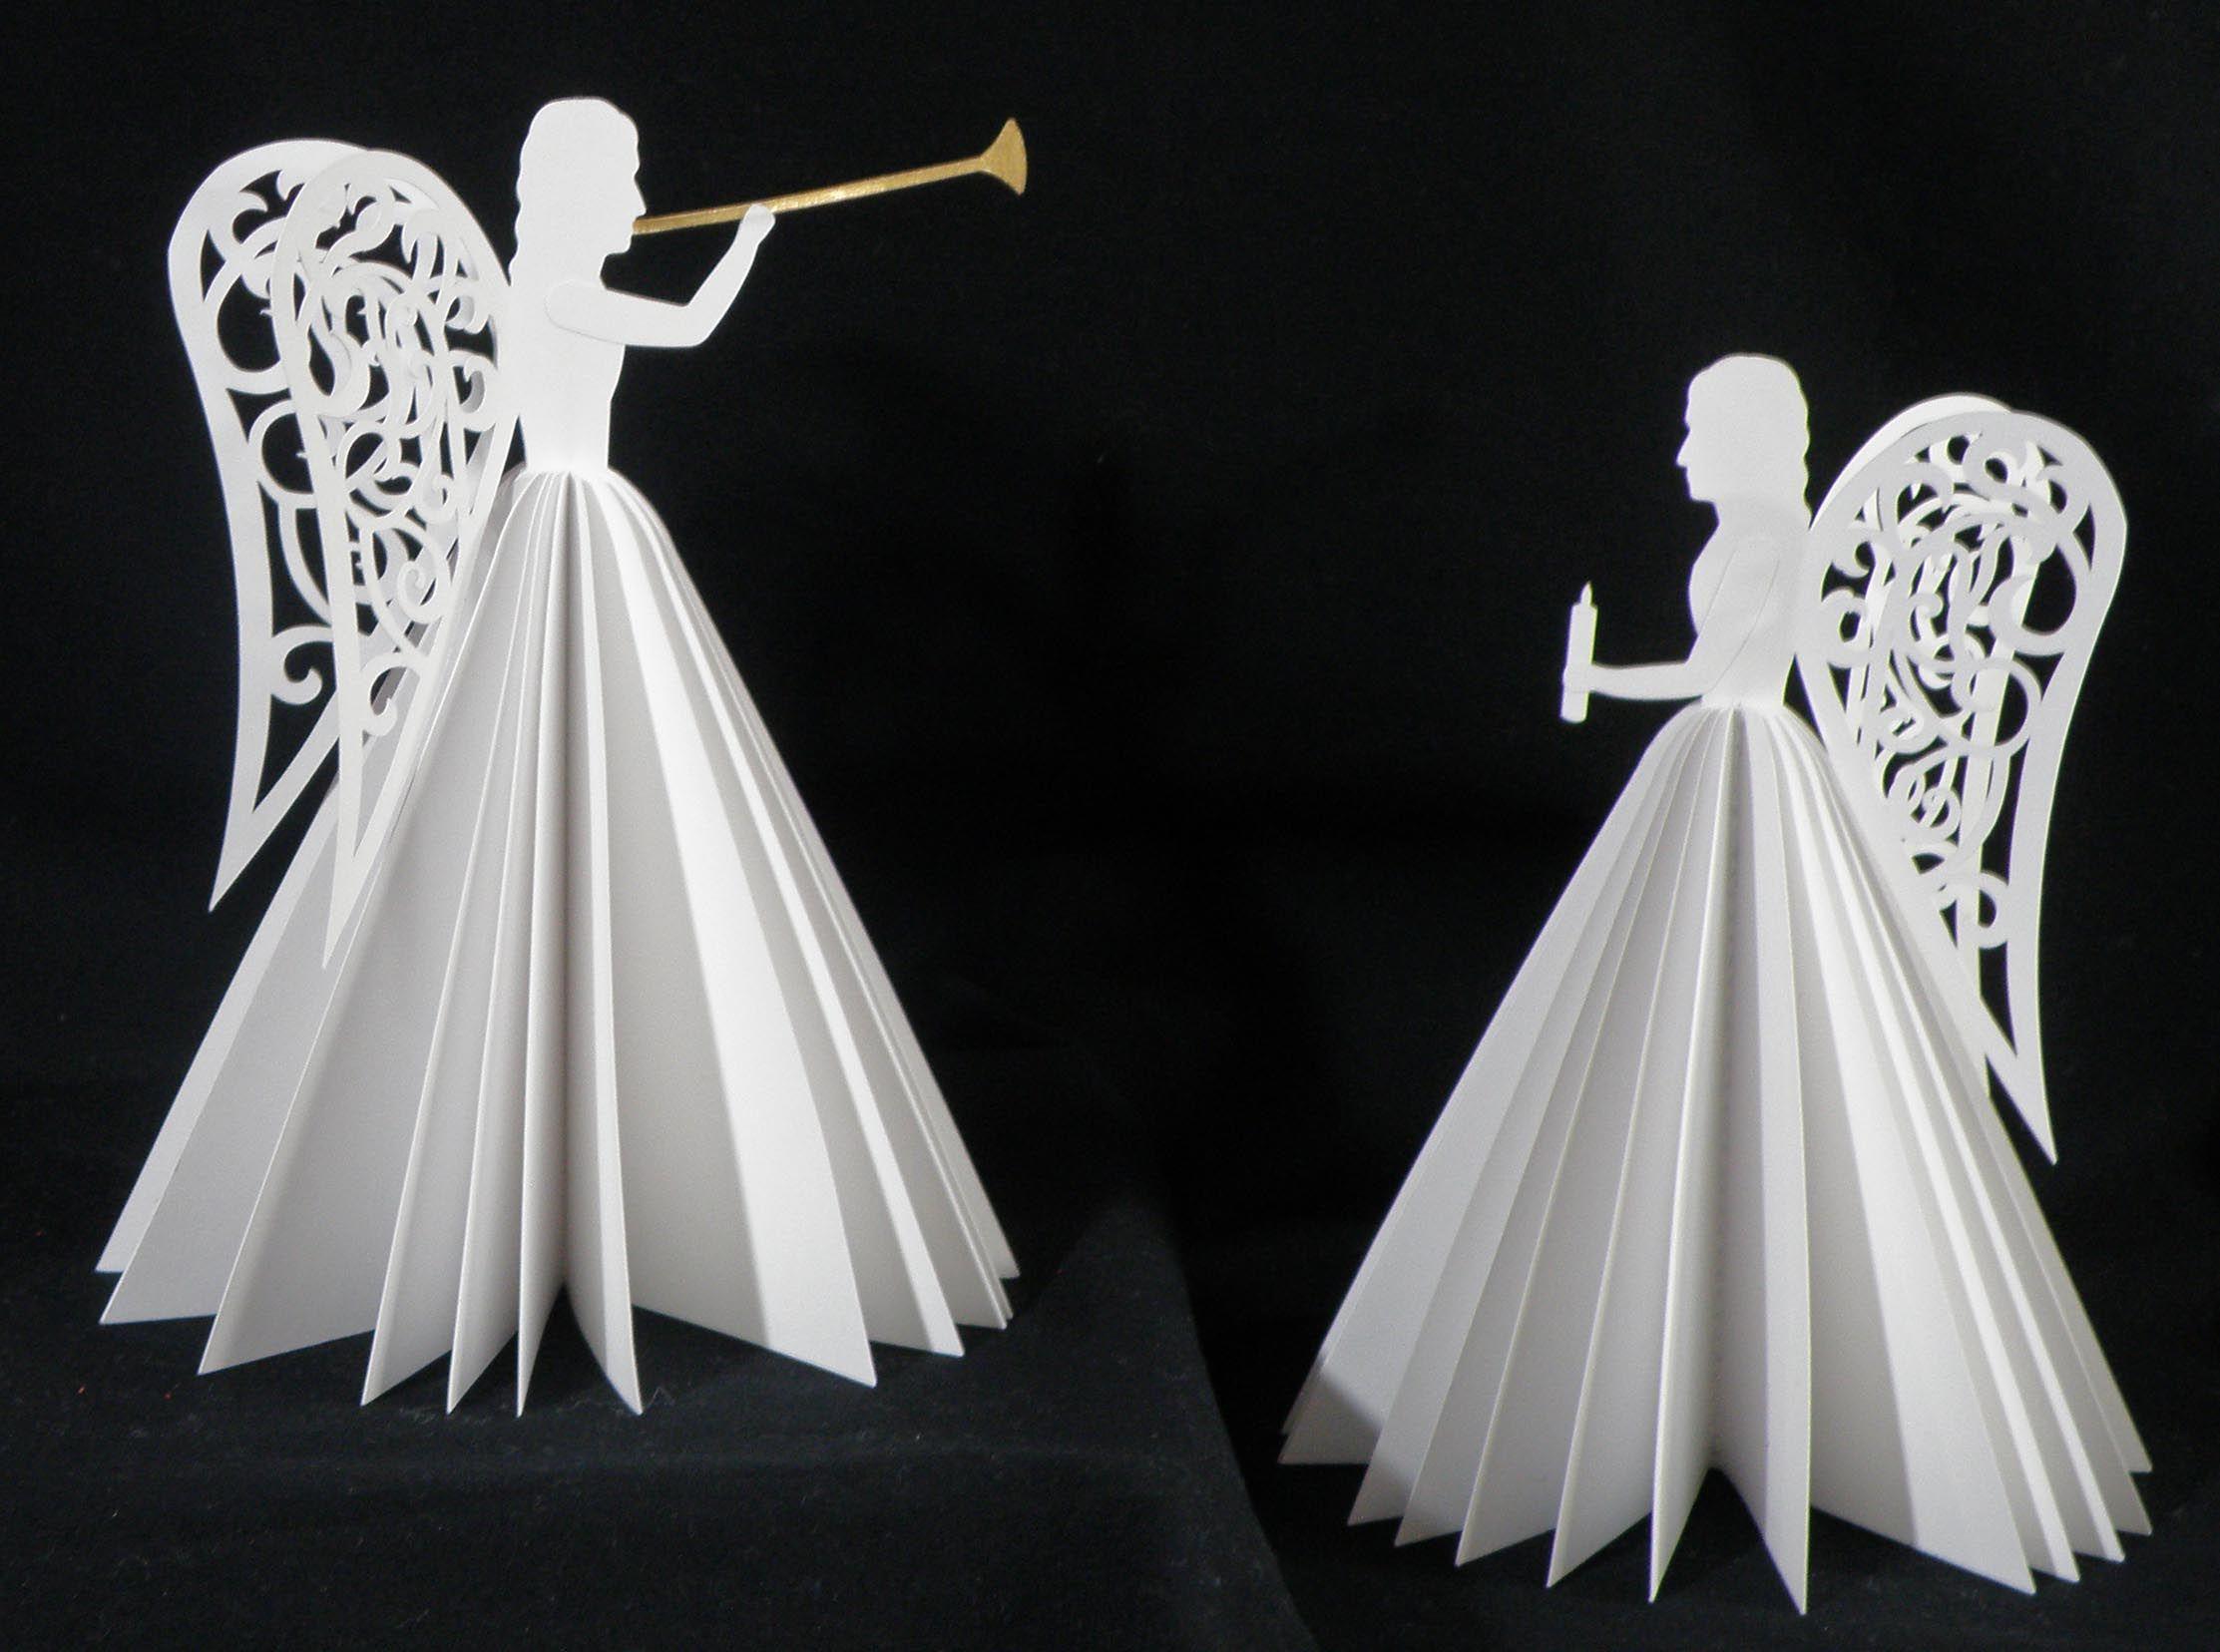 Paper angels teamknkteamknk diy christmas deco gift ideas paper angels teamknkteamknk paper angels diydiy angelschristmas solutioingenieria Images